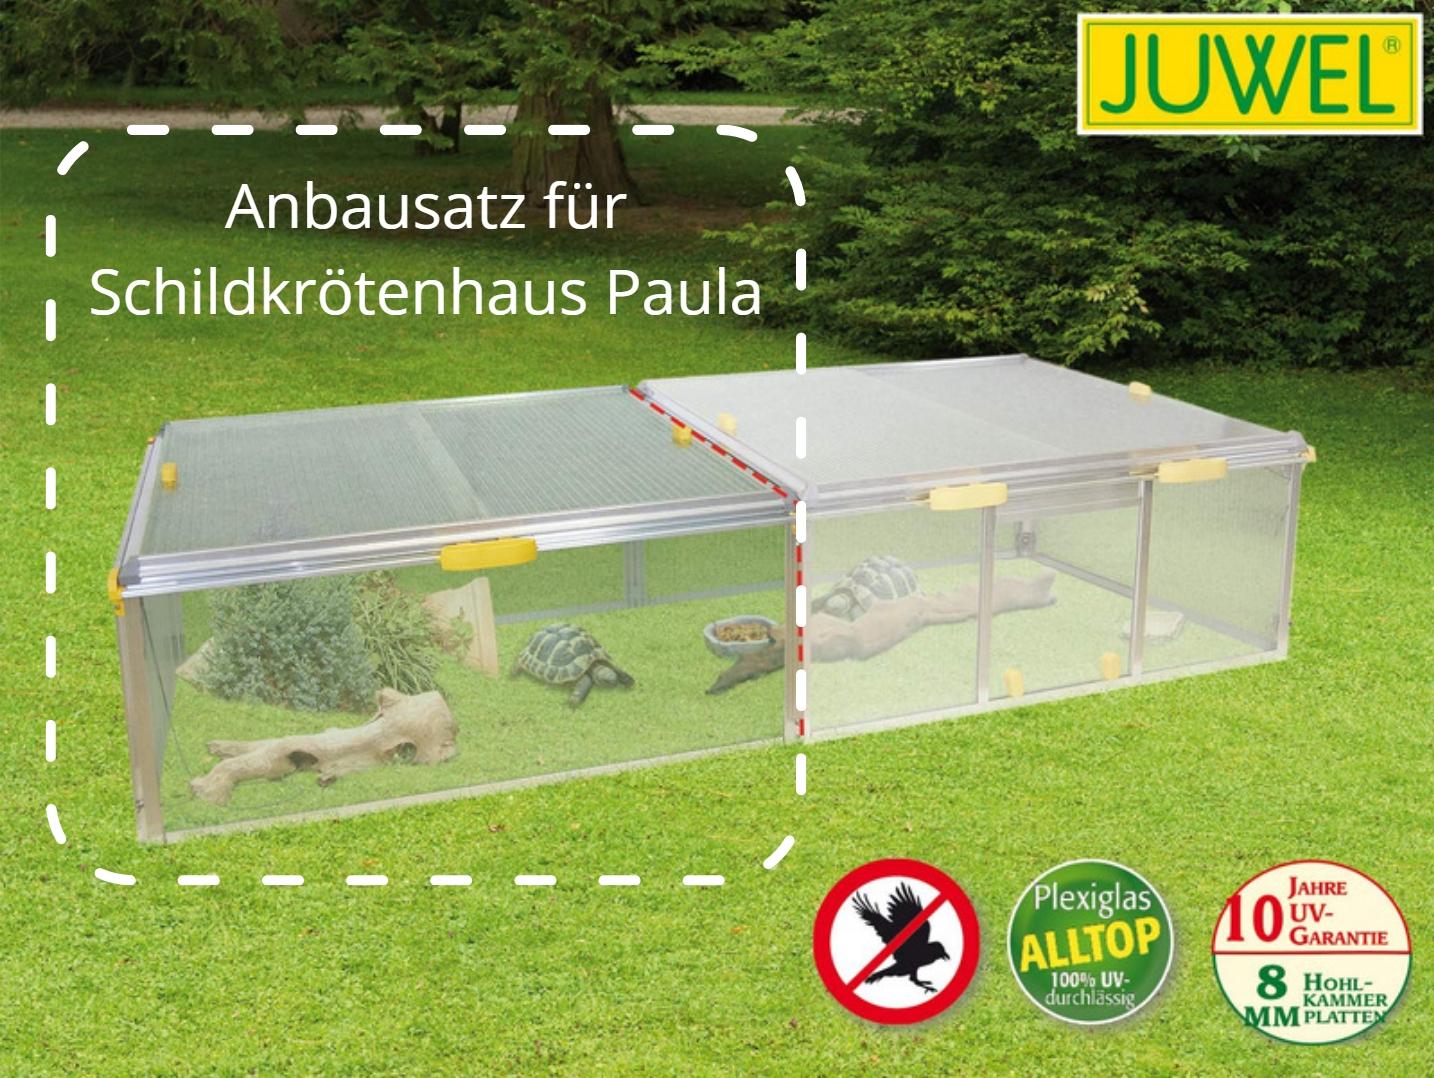 Verlaengerung-Anbausatz-fuer-Schildkroetenhaus-Paula